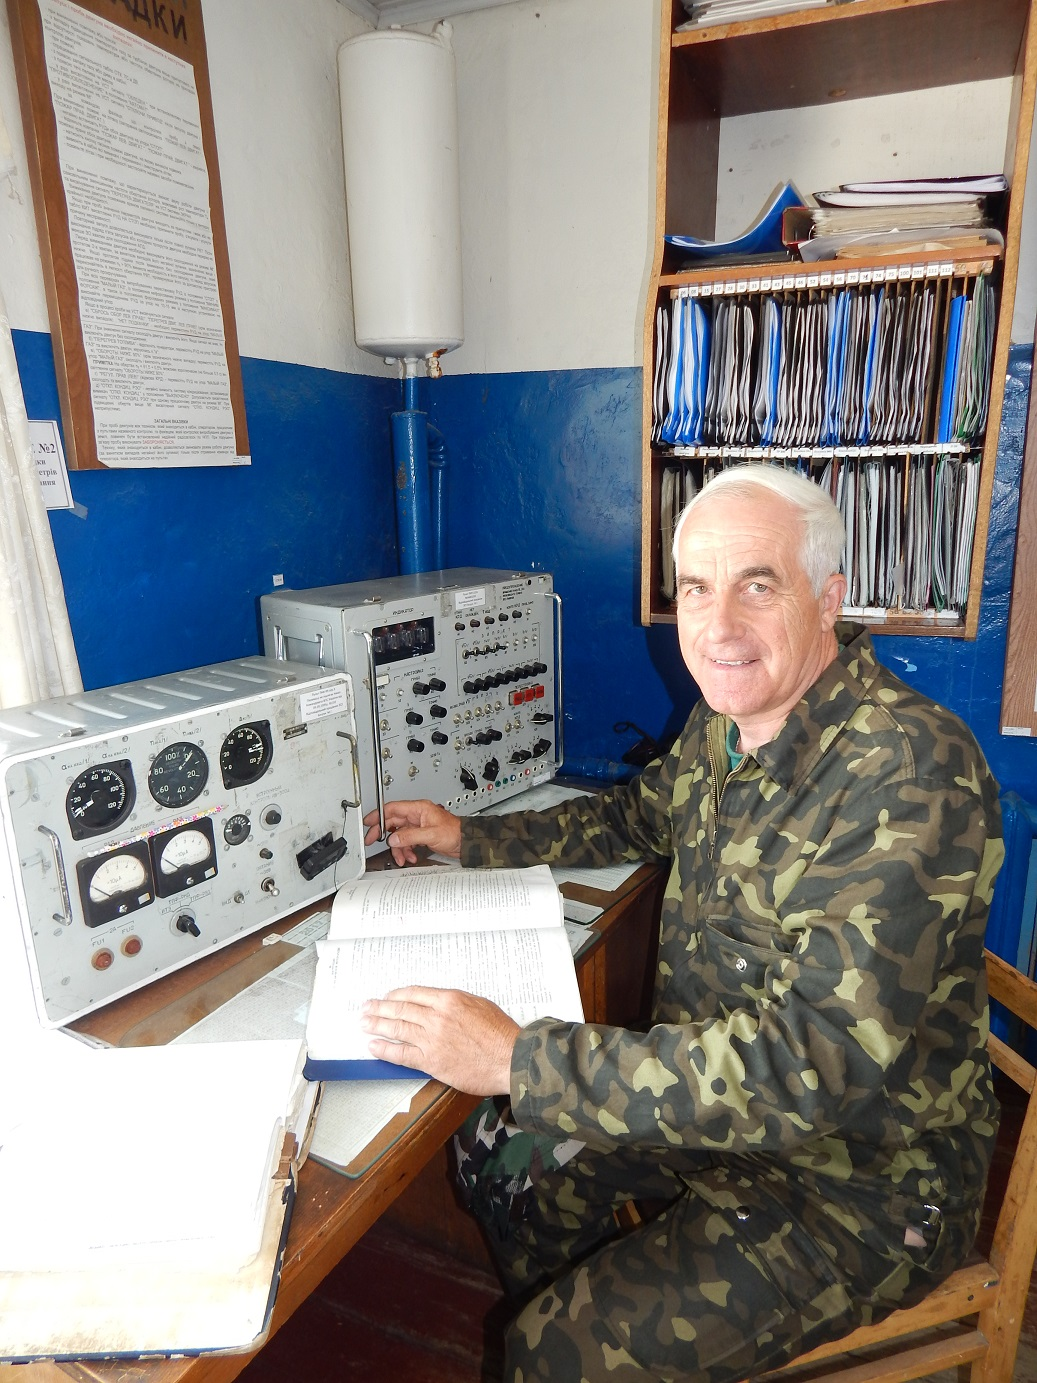 Николай Безрук: от летчика-истребителя до авиационного техника